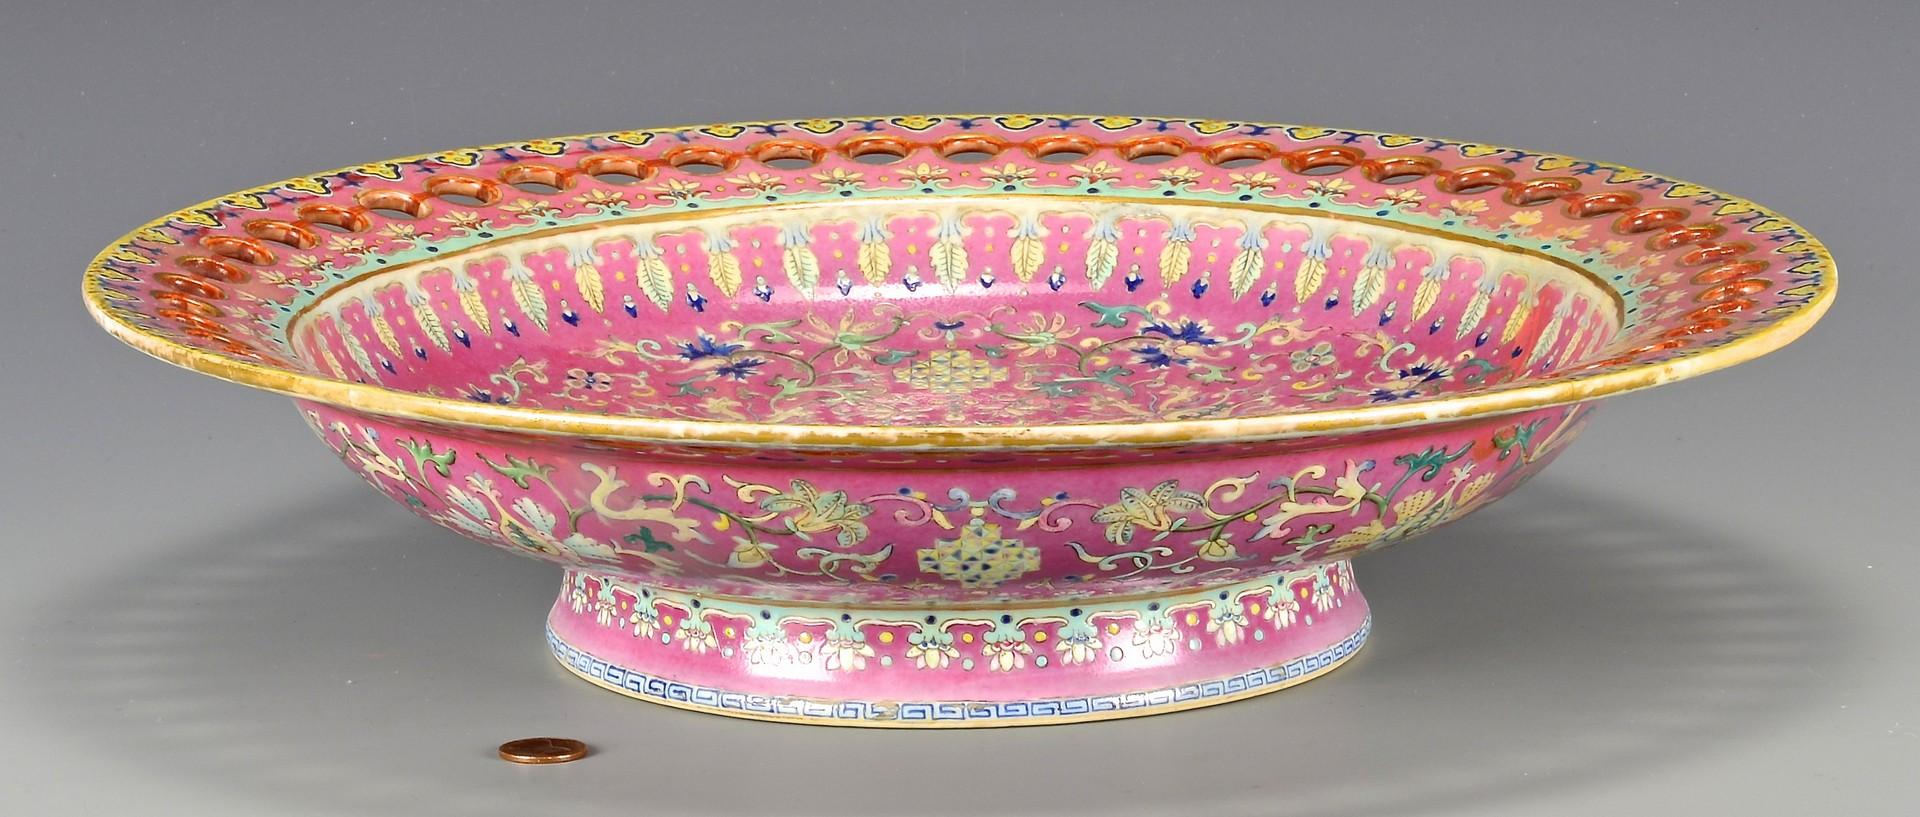 Lot 412: Chinese Famille Rose Dish w/ Pierced Rim